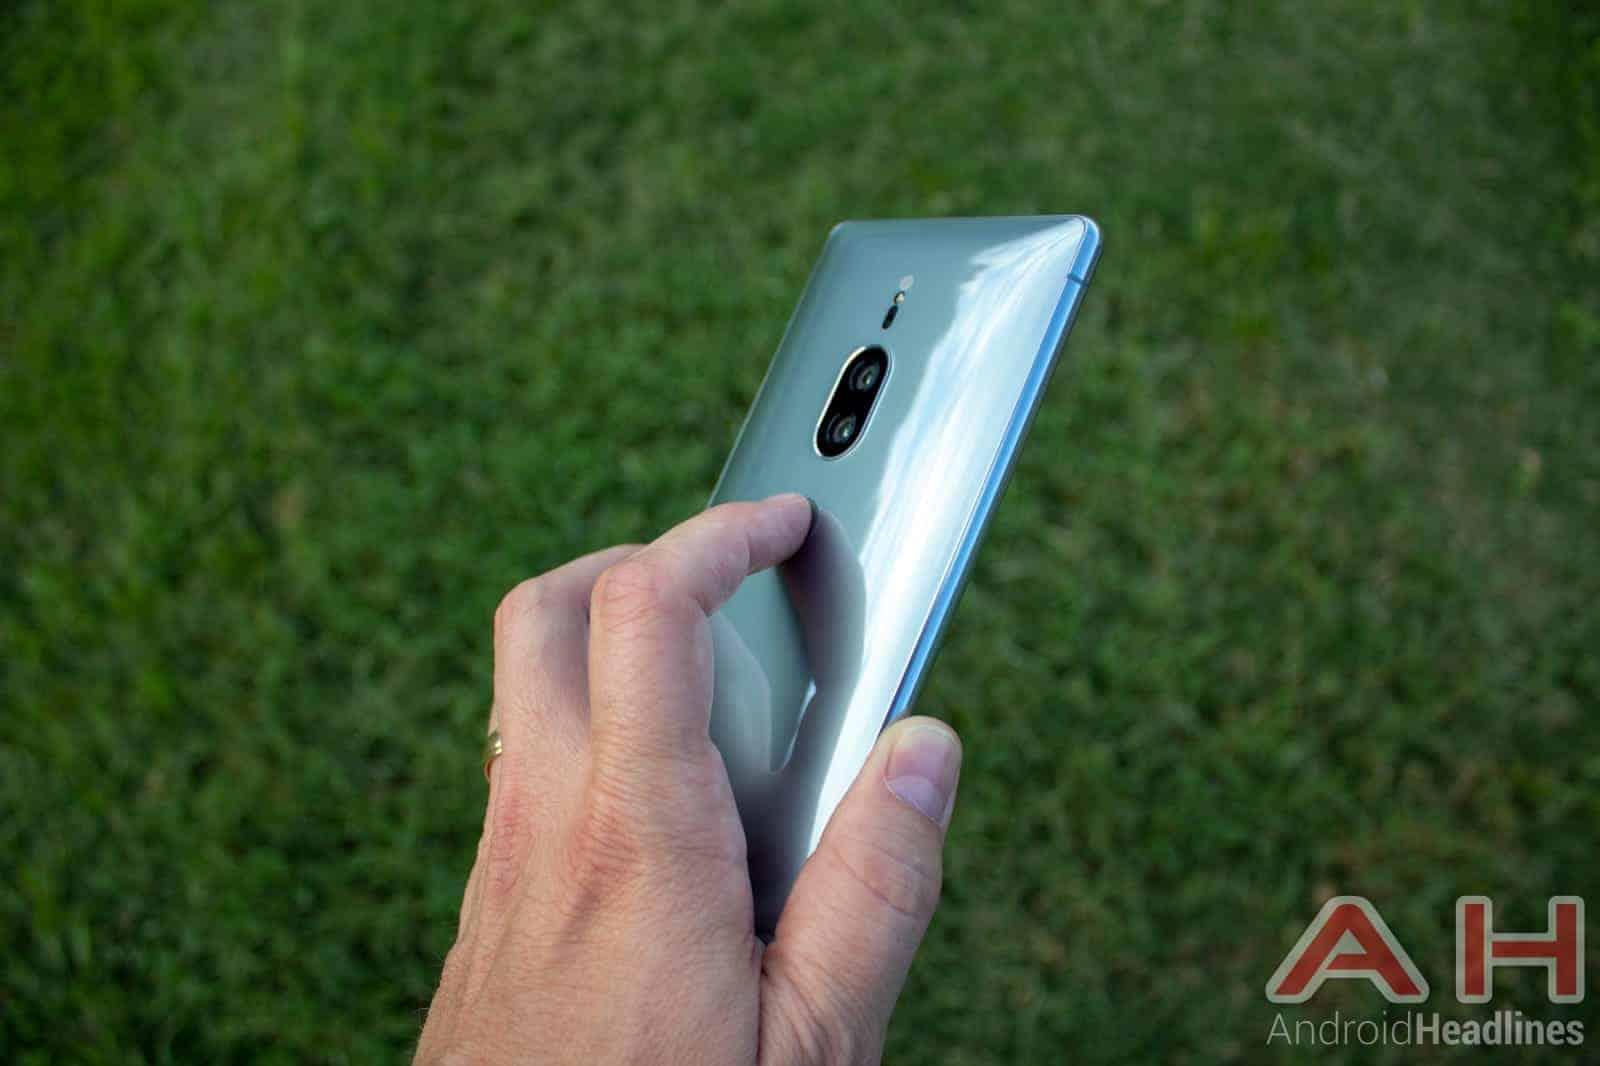 Sony Xperia XZ2 Premium AH NS 08 fingerprint use